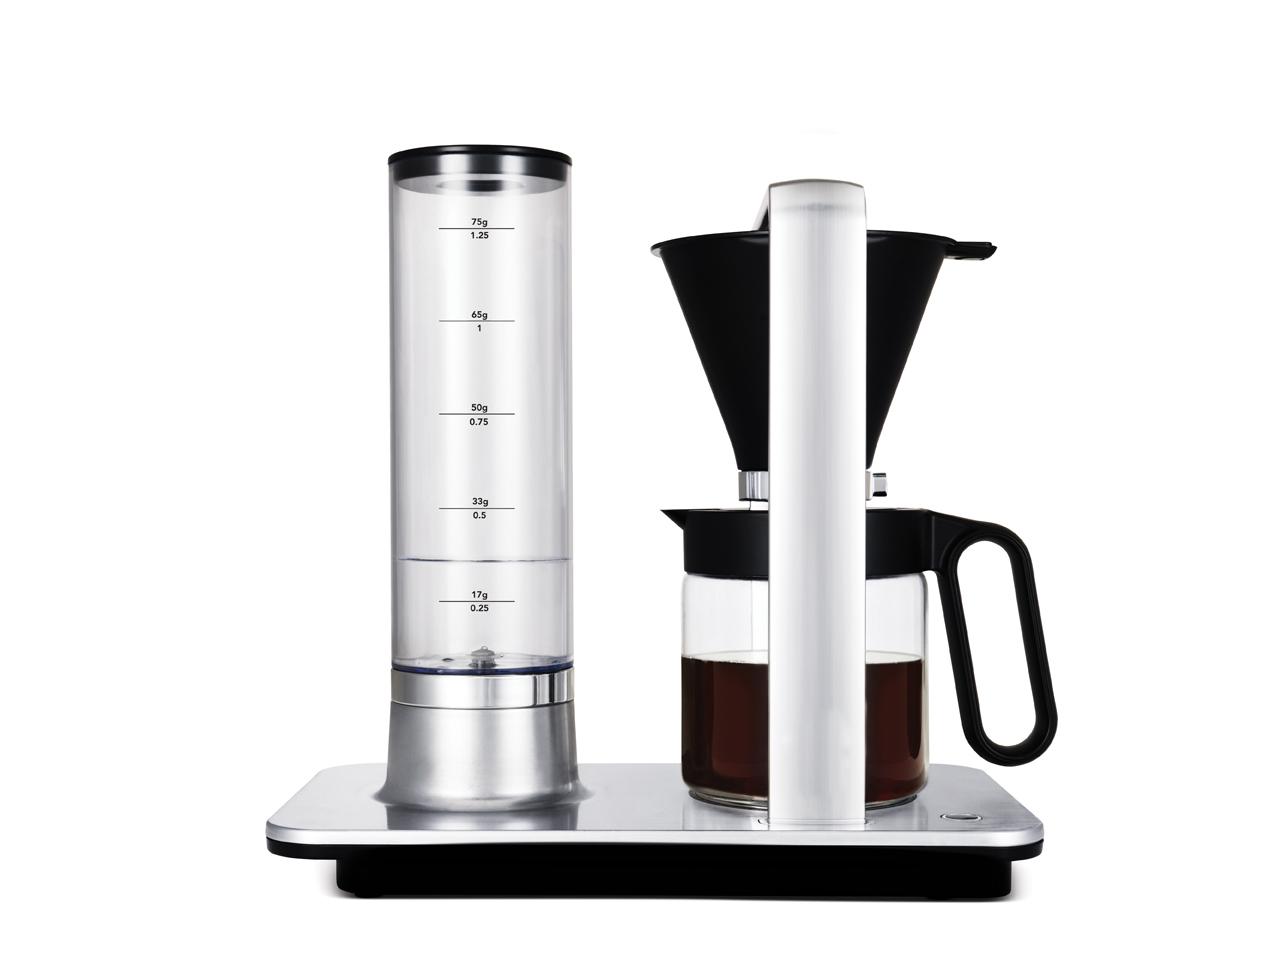 kaffe-trakter